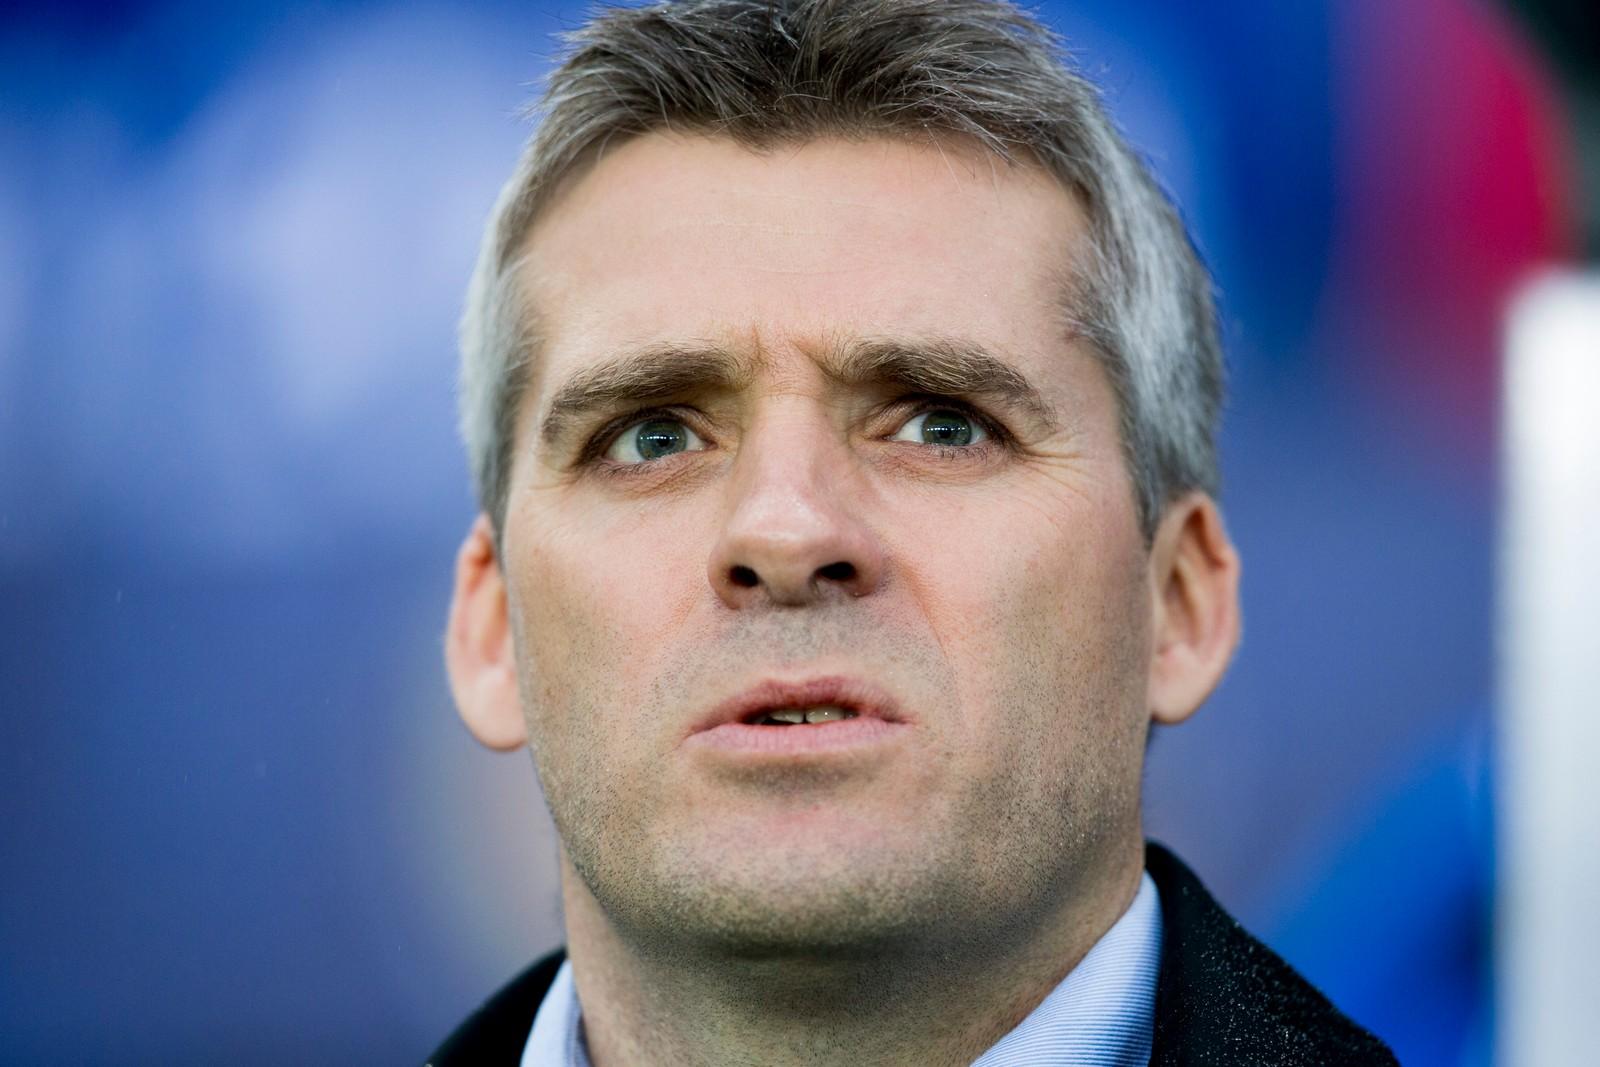 Molde-trener Tor Ole Skullerud før cupfinalen.